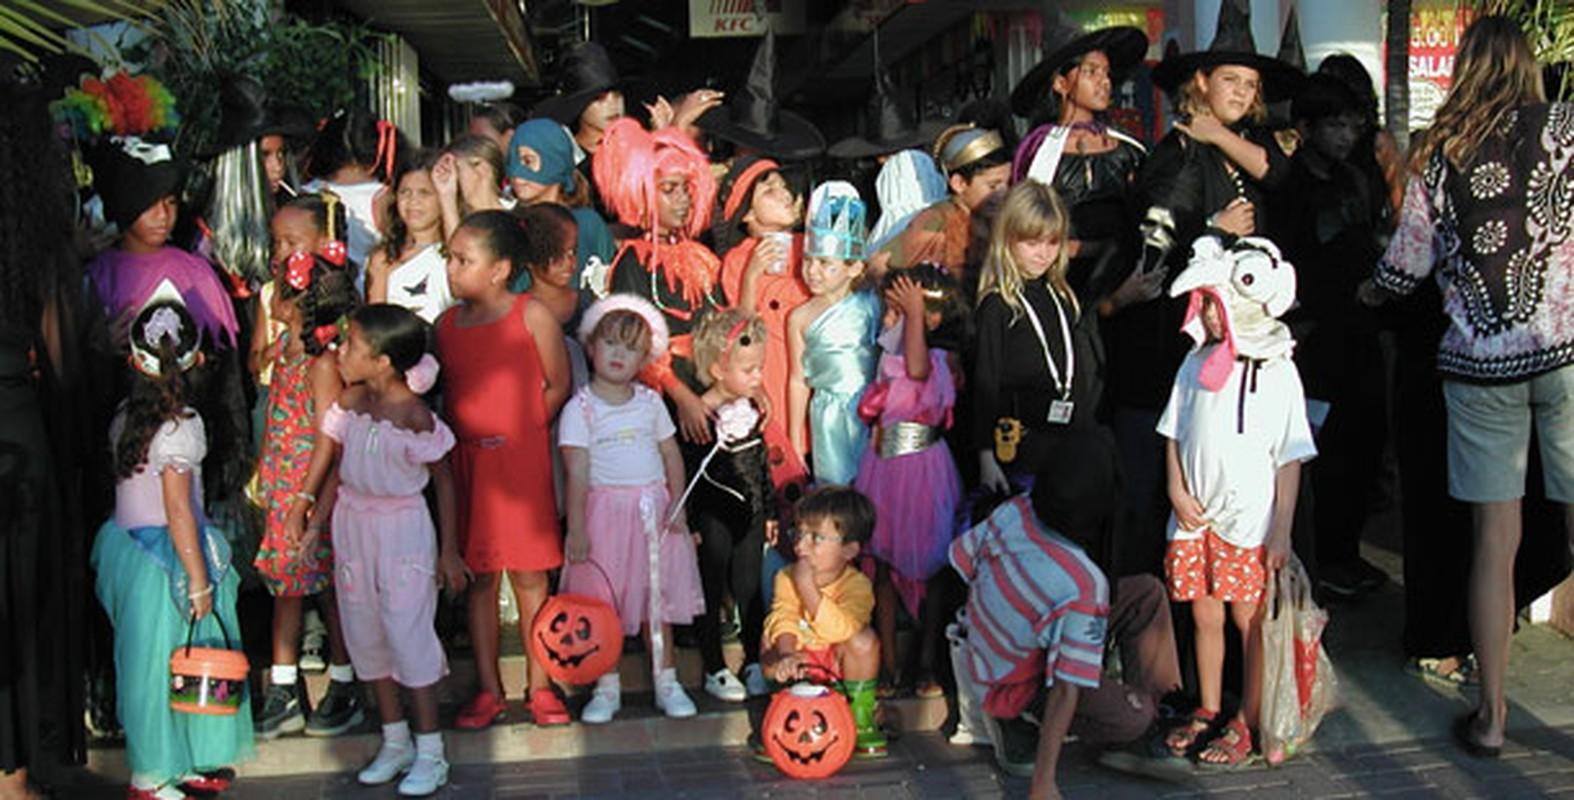 Giai ma 10 su that hiem co kho tin nhat ve Halloween-Hinh-3